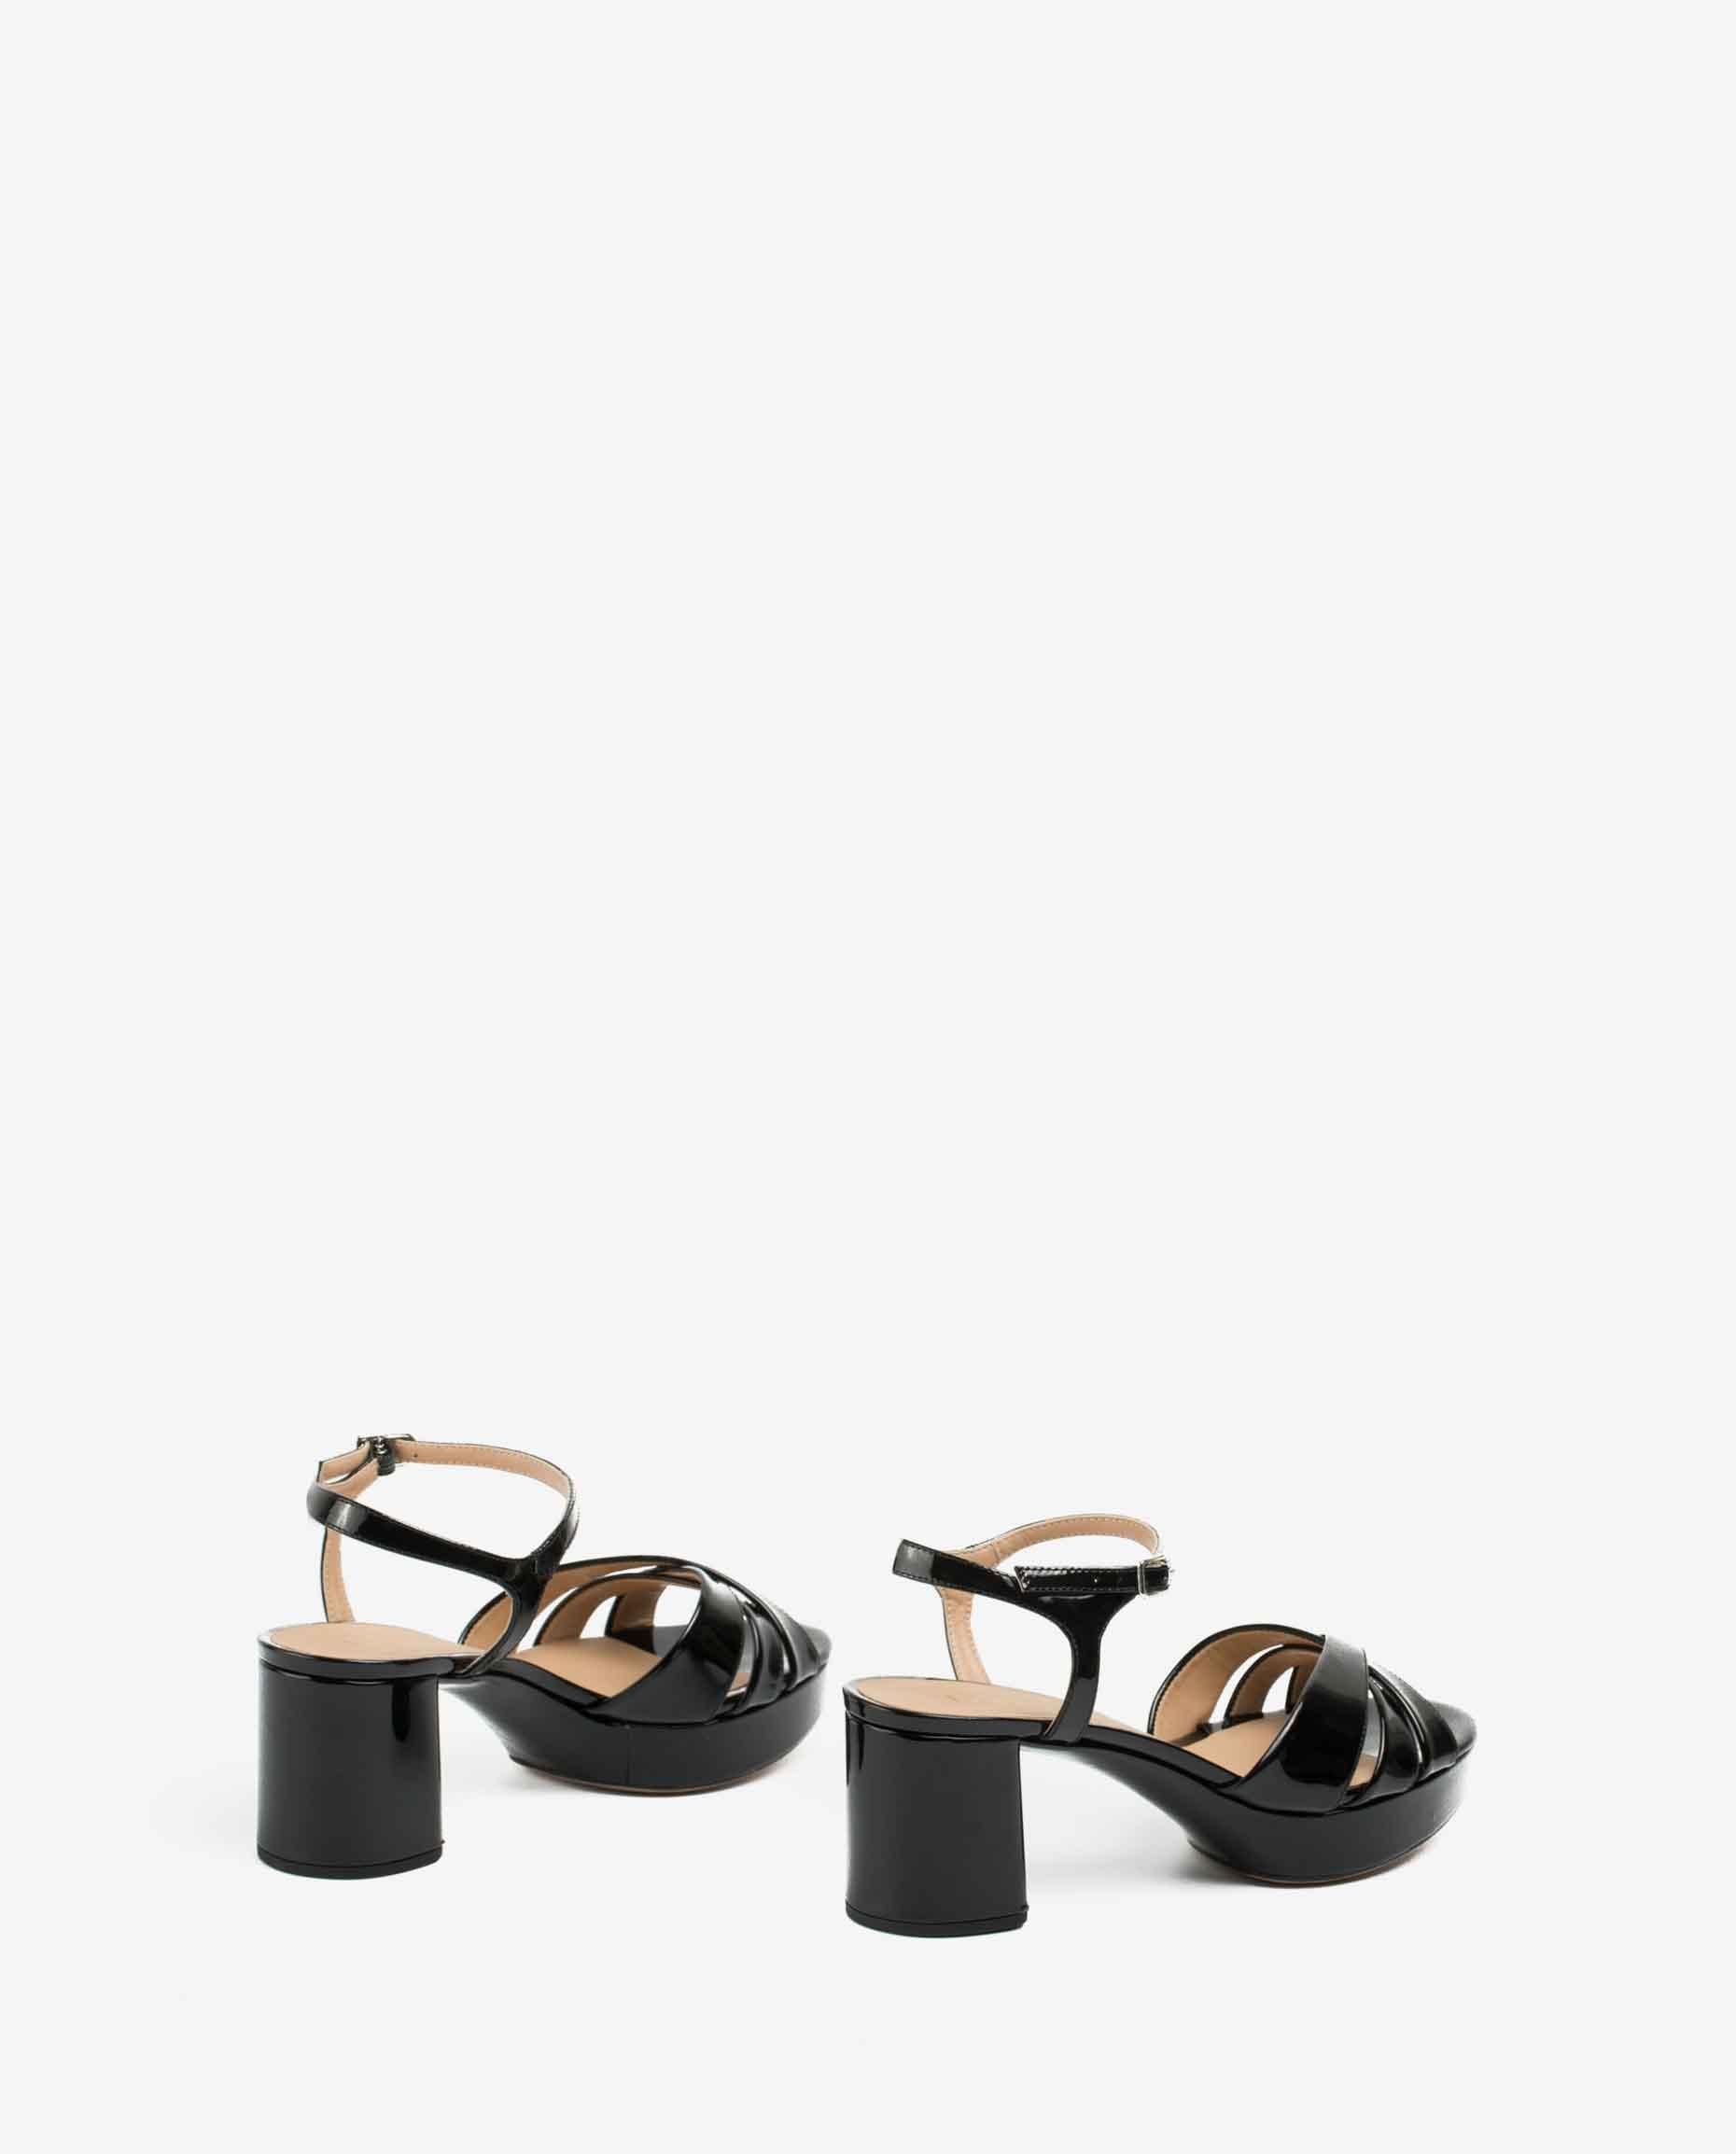 UNISA Black crossed straps platform sandals NETA_PA black 2